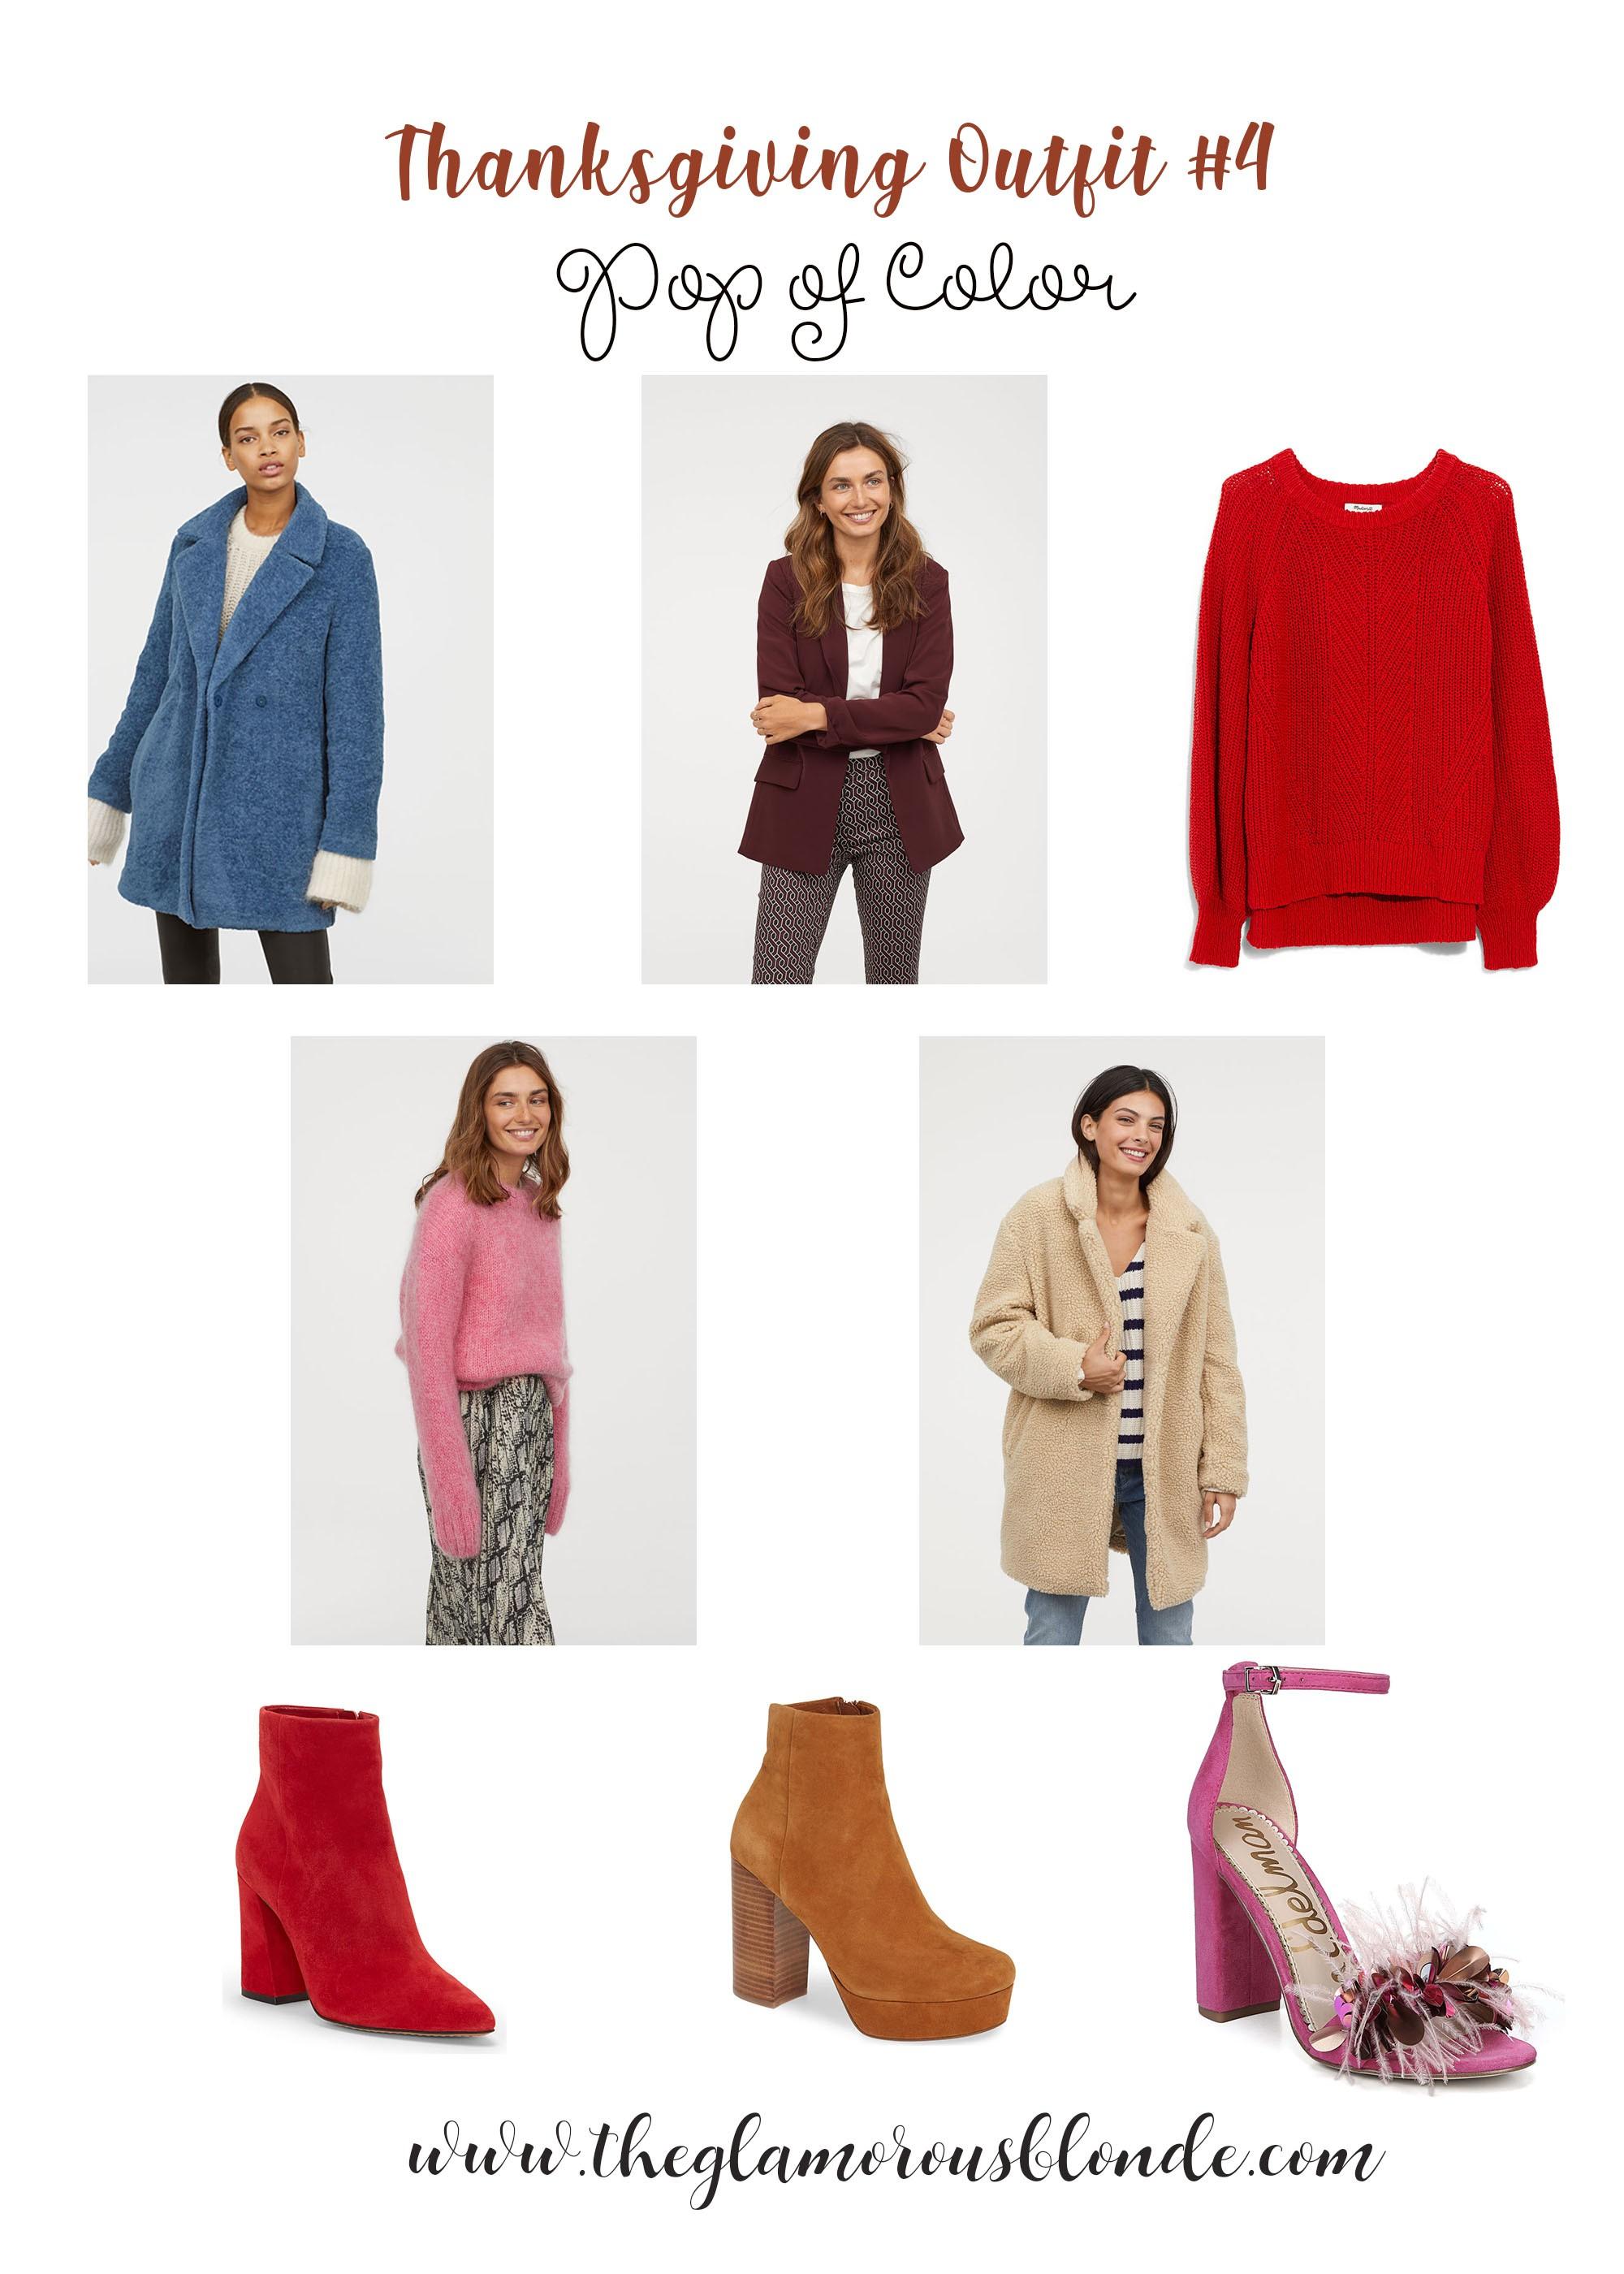 dd4589b1292 Thanksgiving Outfit ideas